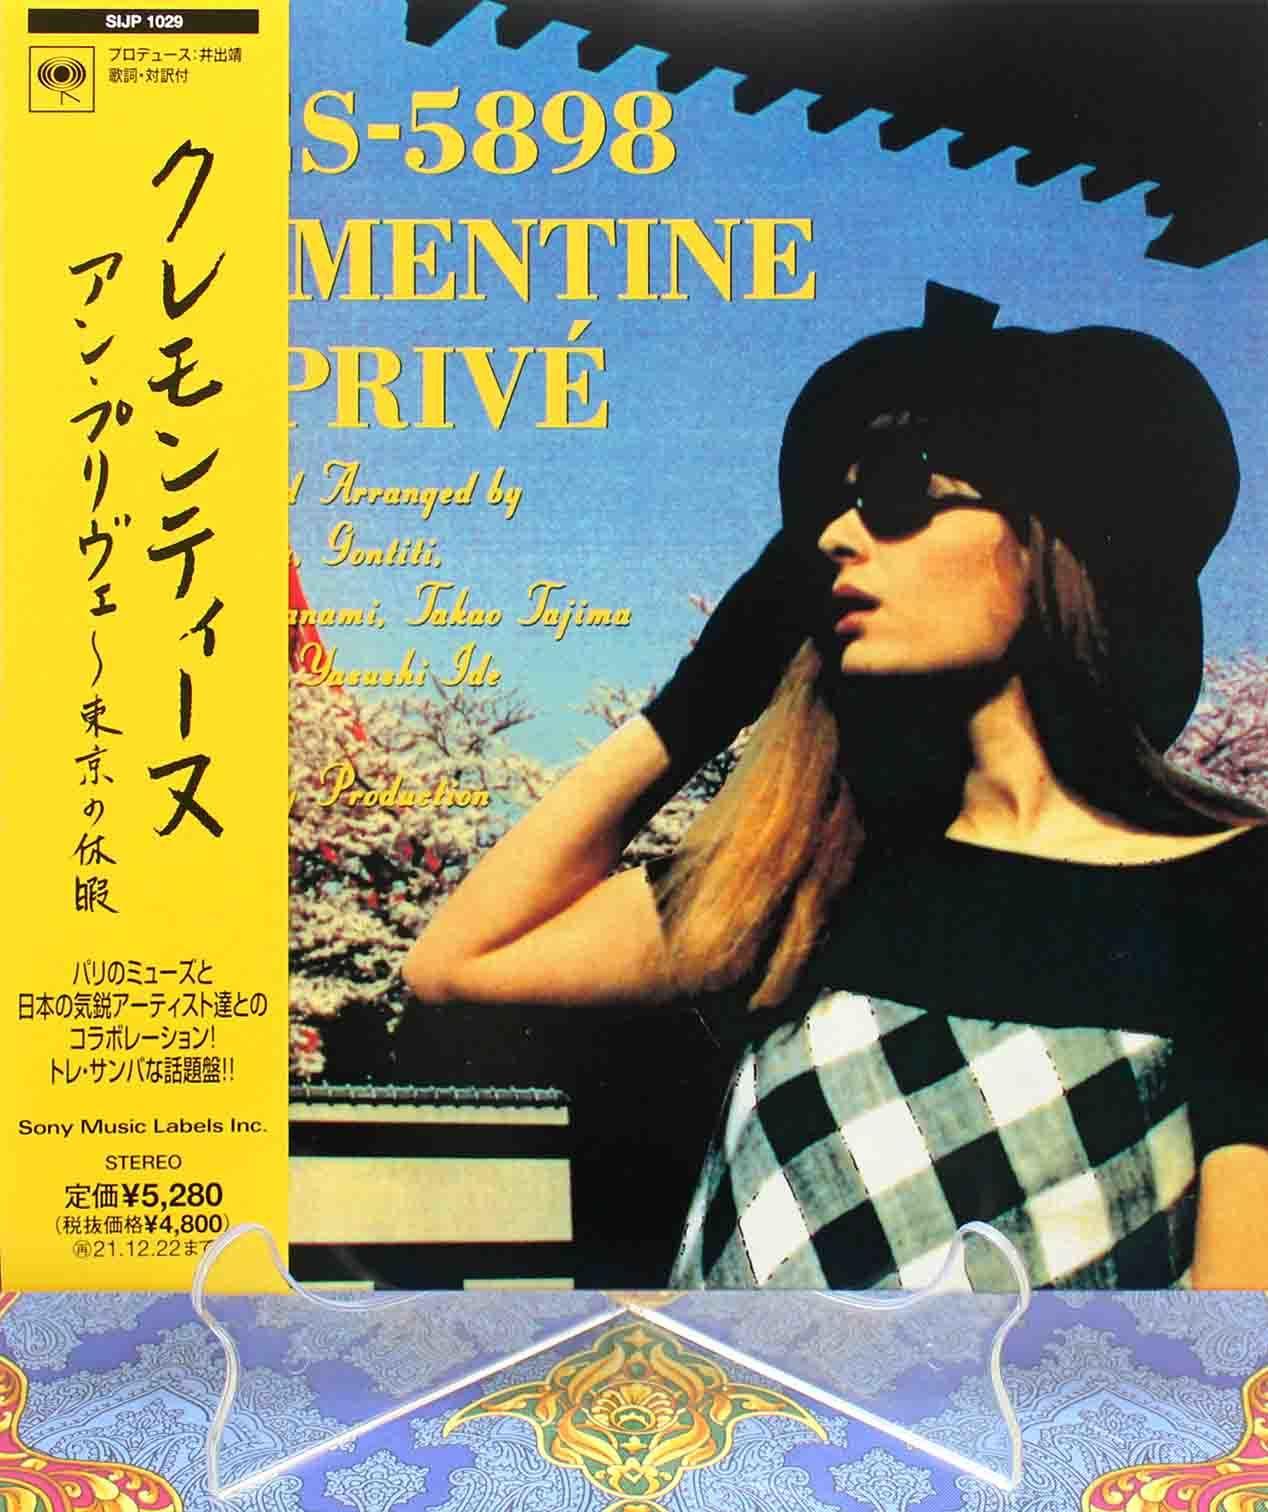 Clémentine = クレモンティーヌ 東京の休暇 En Privé 01